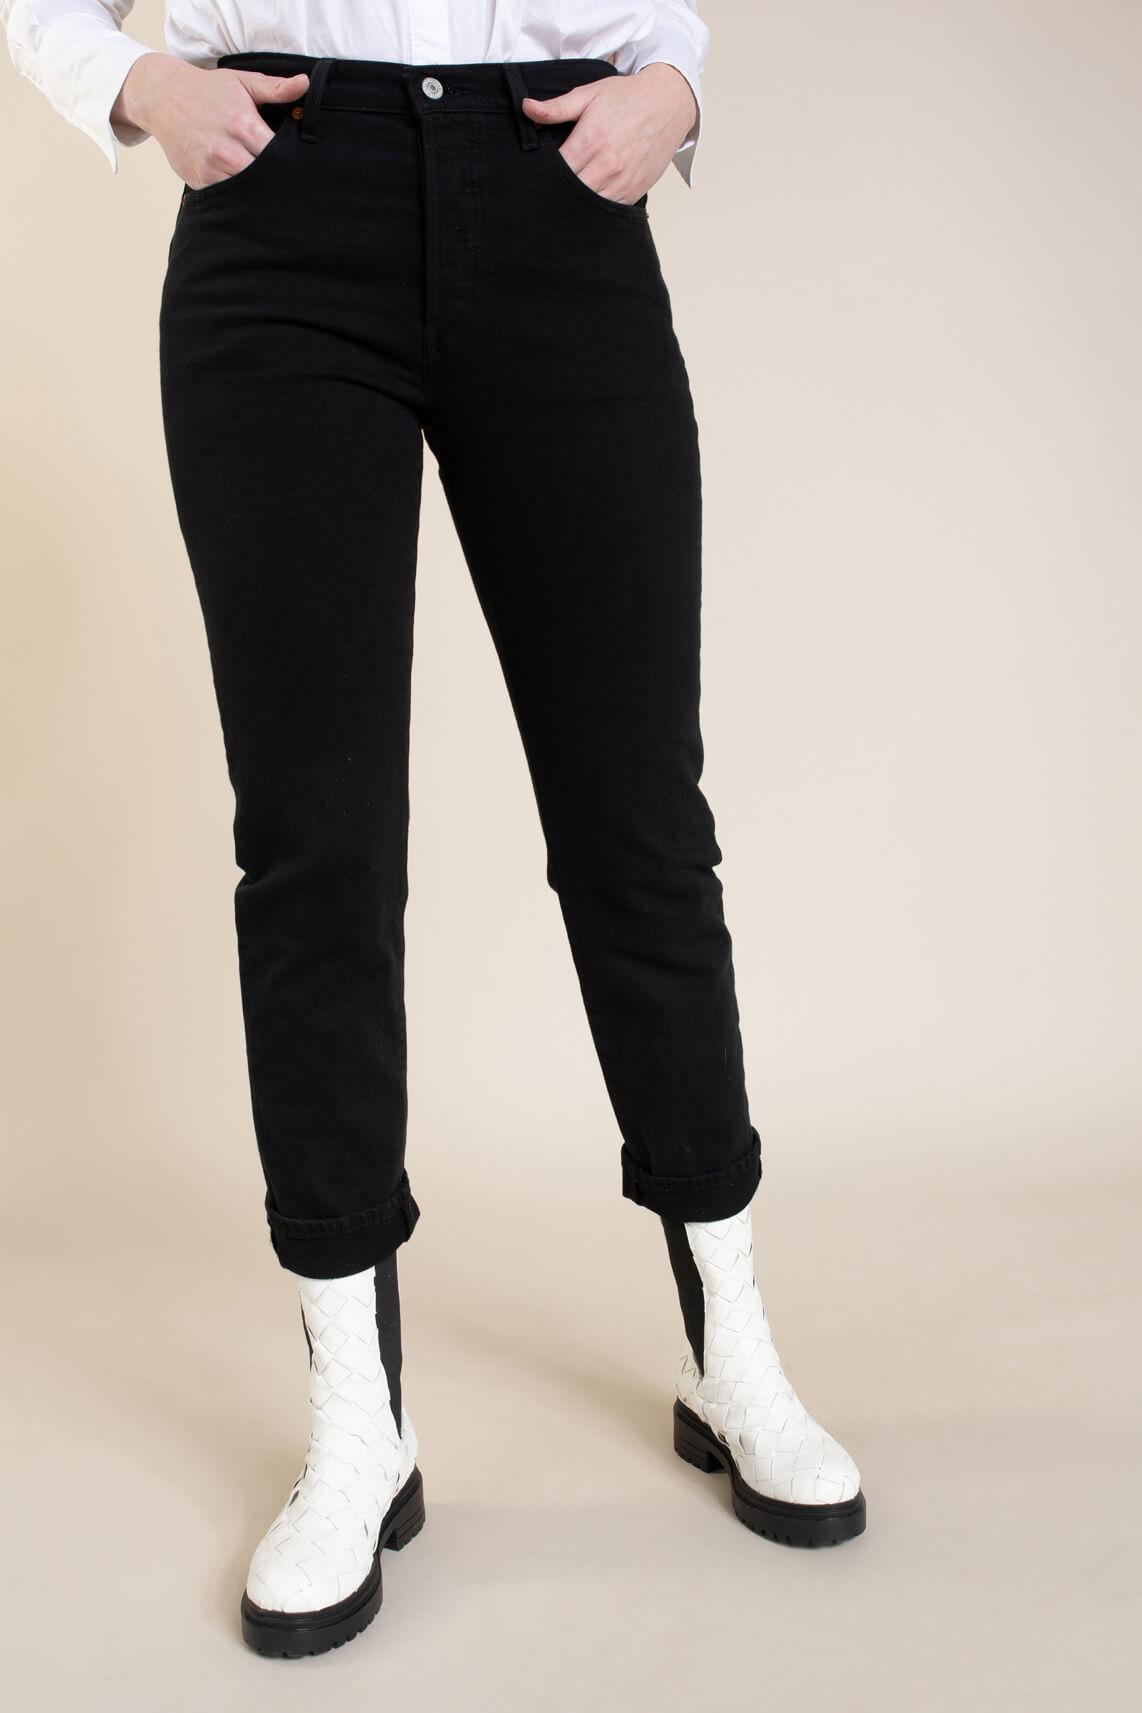 Levi's Dames 501 L30 cropped jeans Zwart